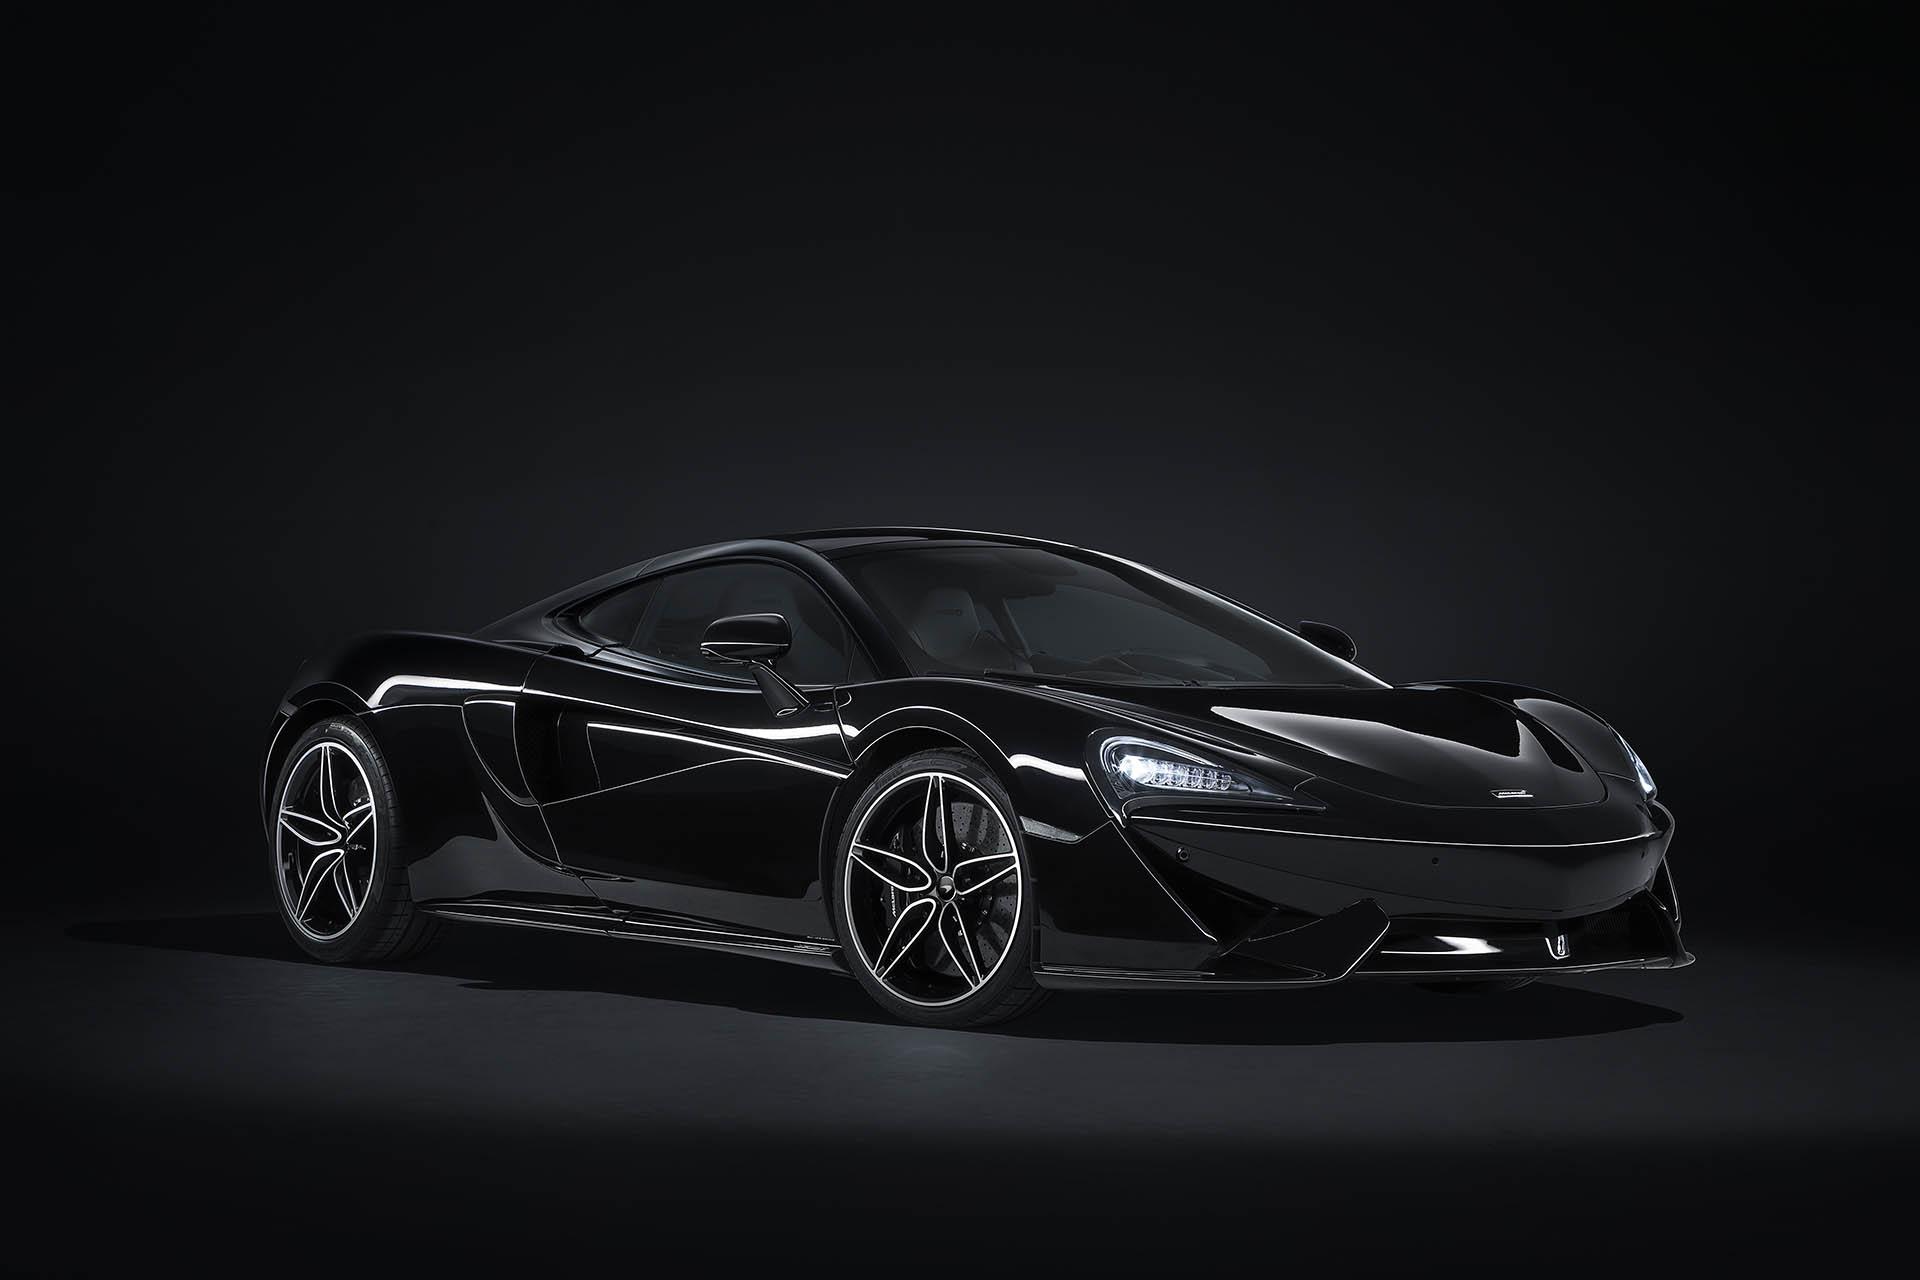 McLaren 570 GT MSO Black Collection